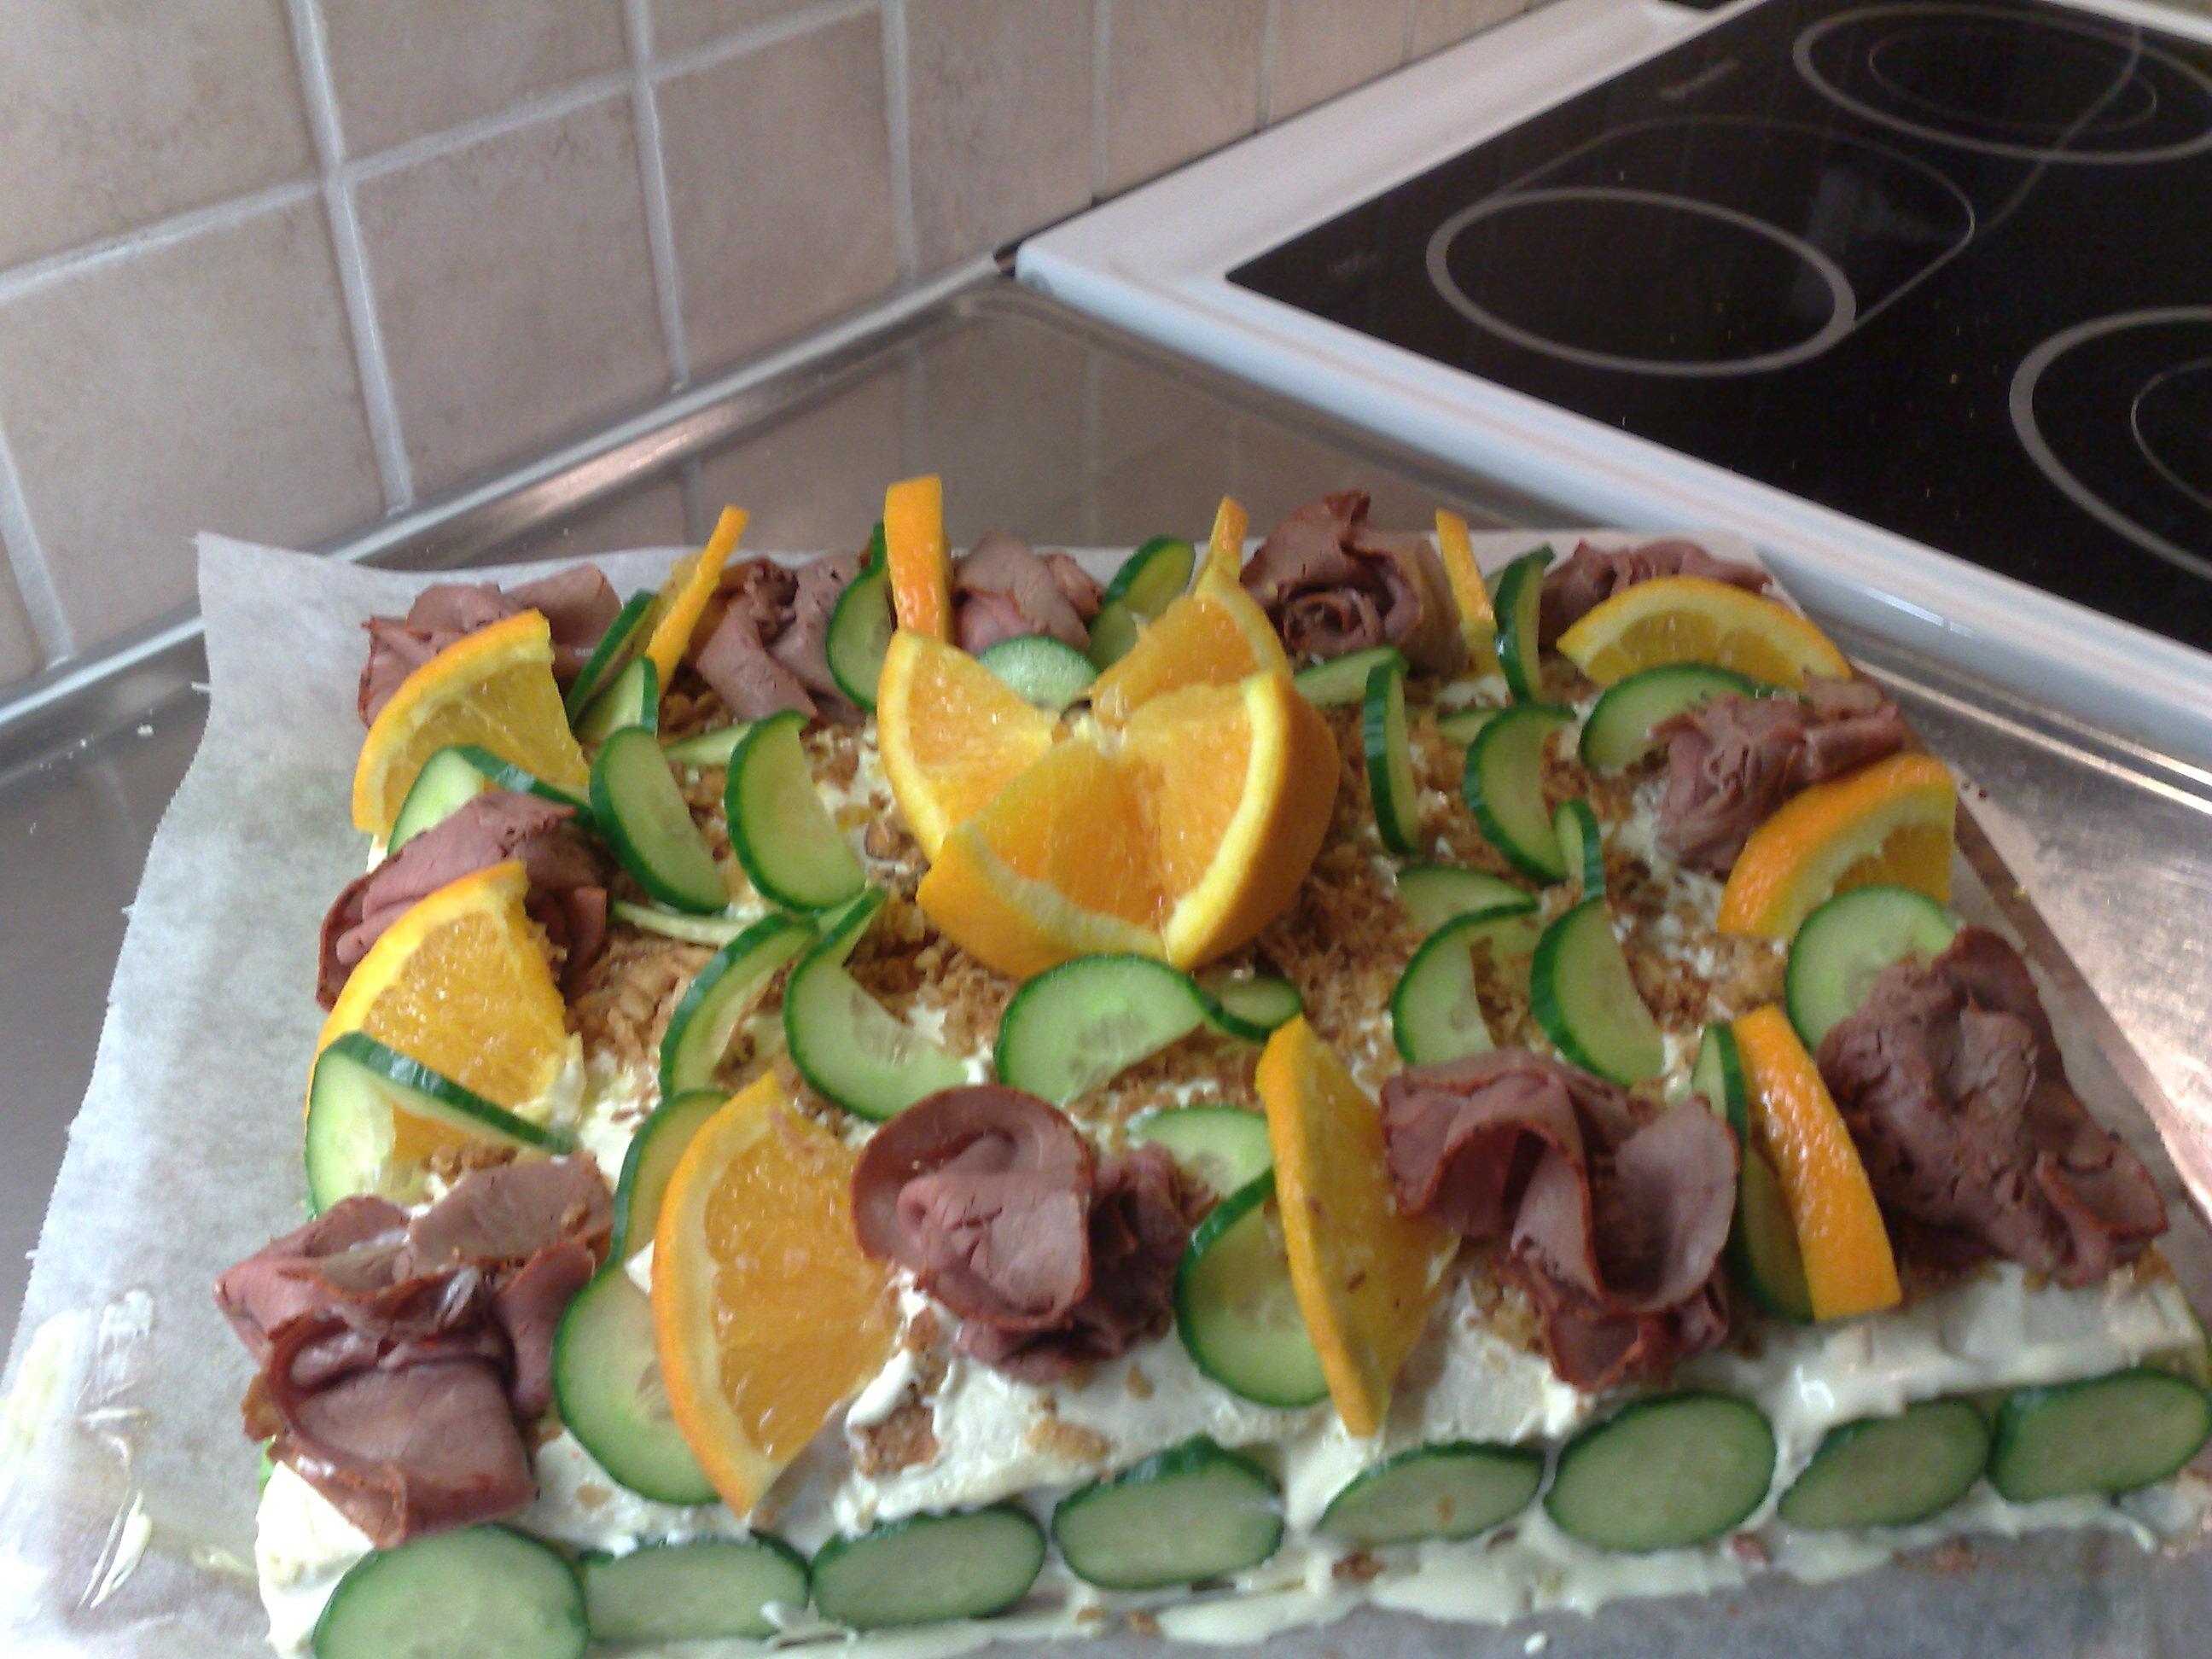 rostbiffstårta